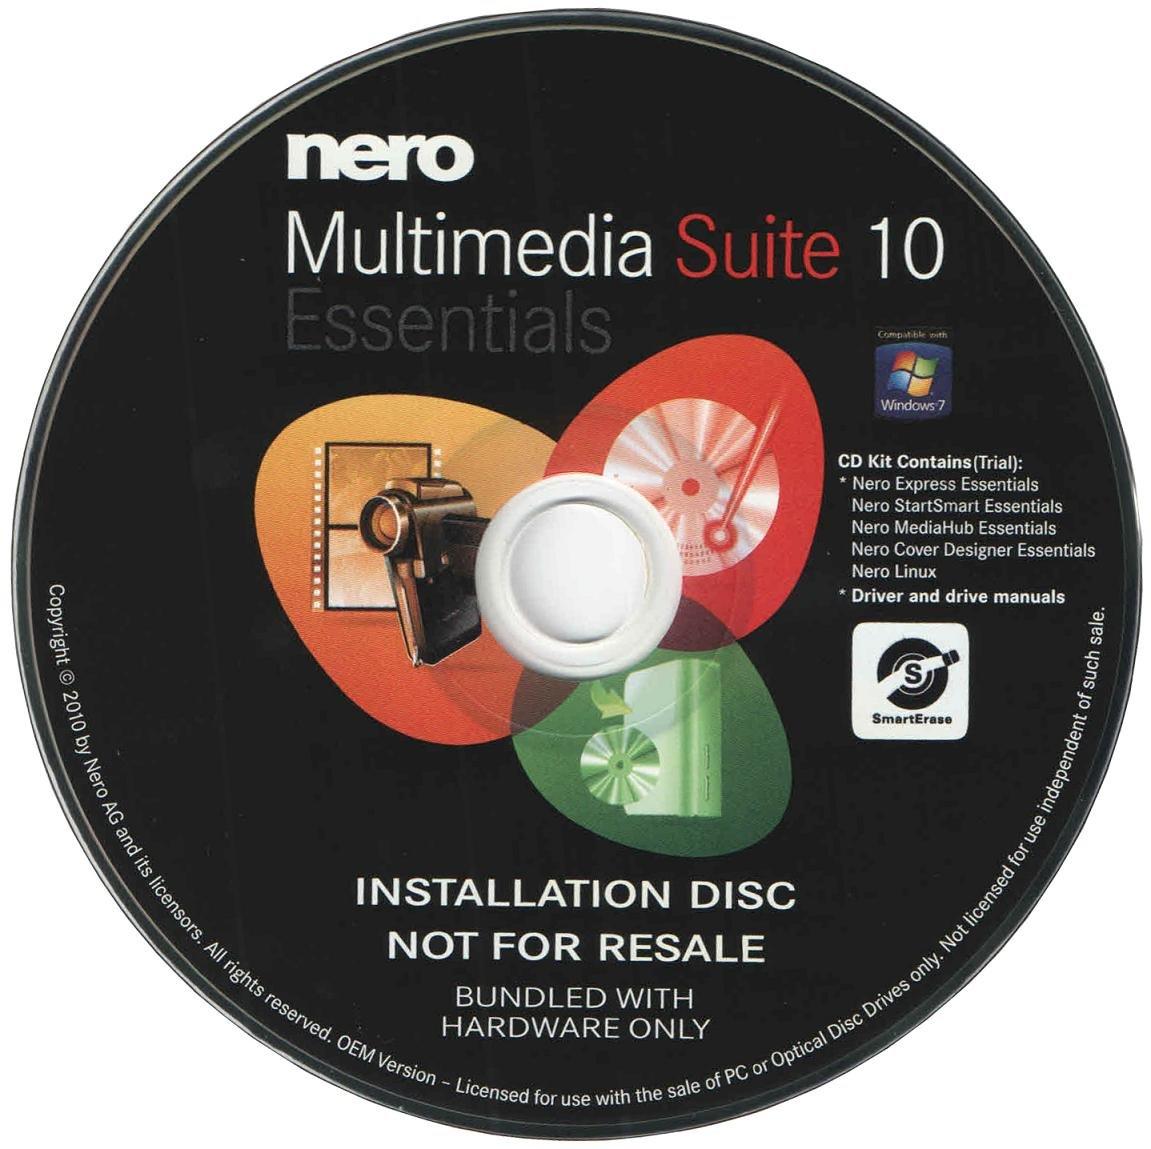 Amazon.com: Nero 10 Essentials Multimedia Suite CD/DVD Burning Software  (OEM Version): Musical Instruments